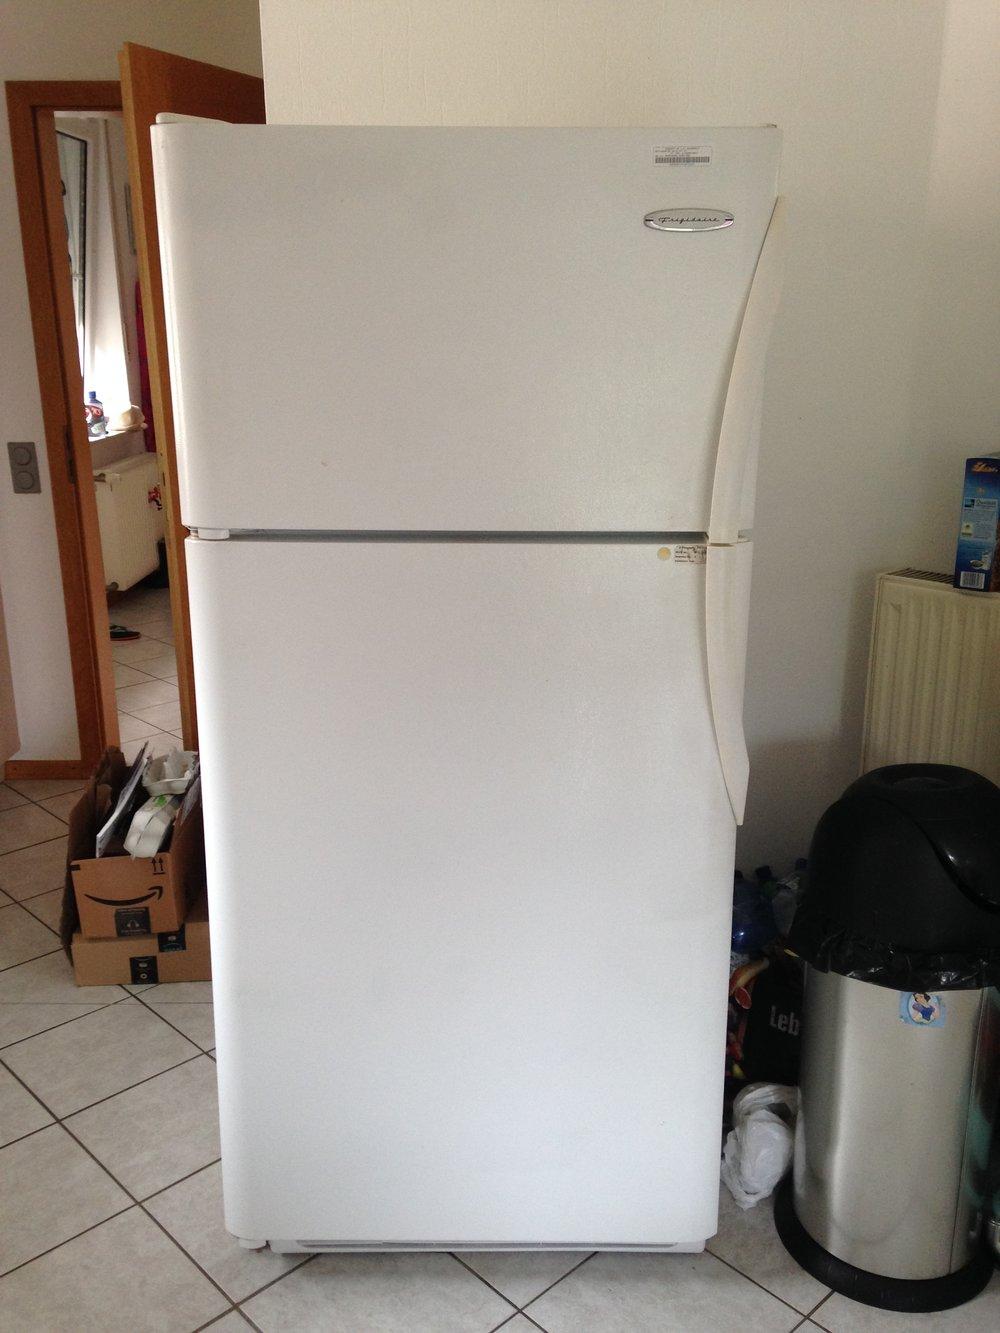 German Kühlschrank vs  American Refrigerator — Military